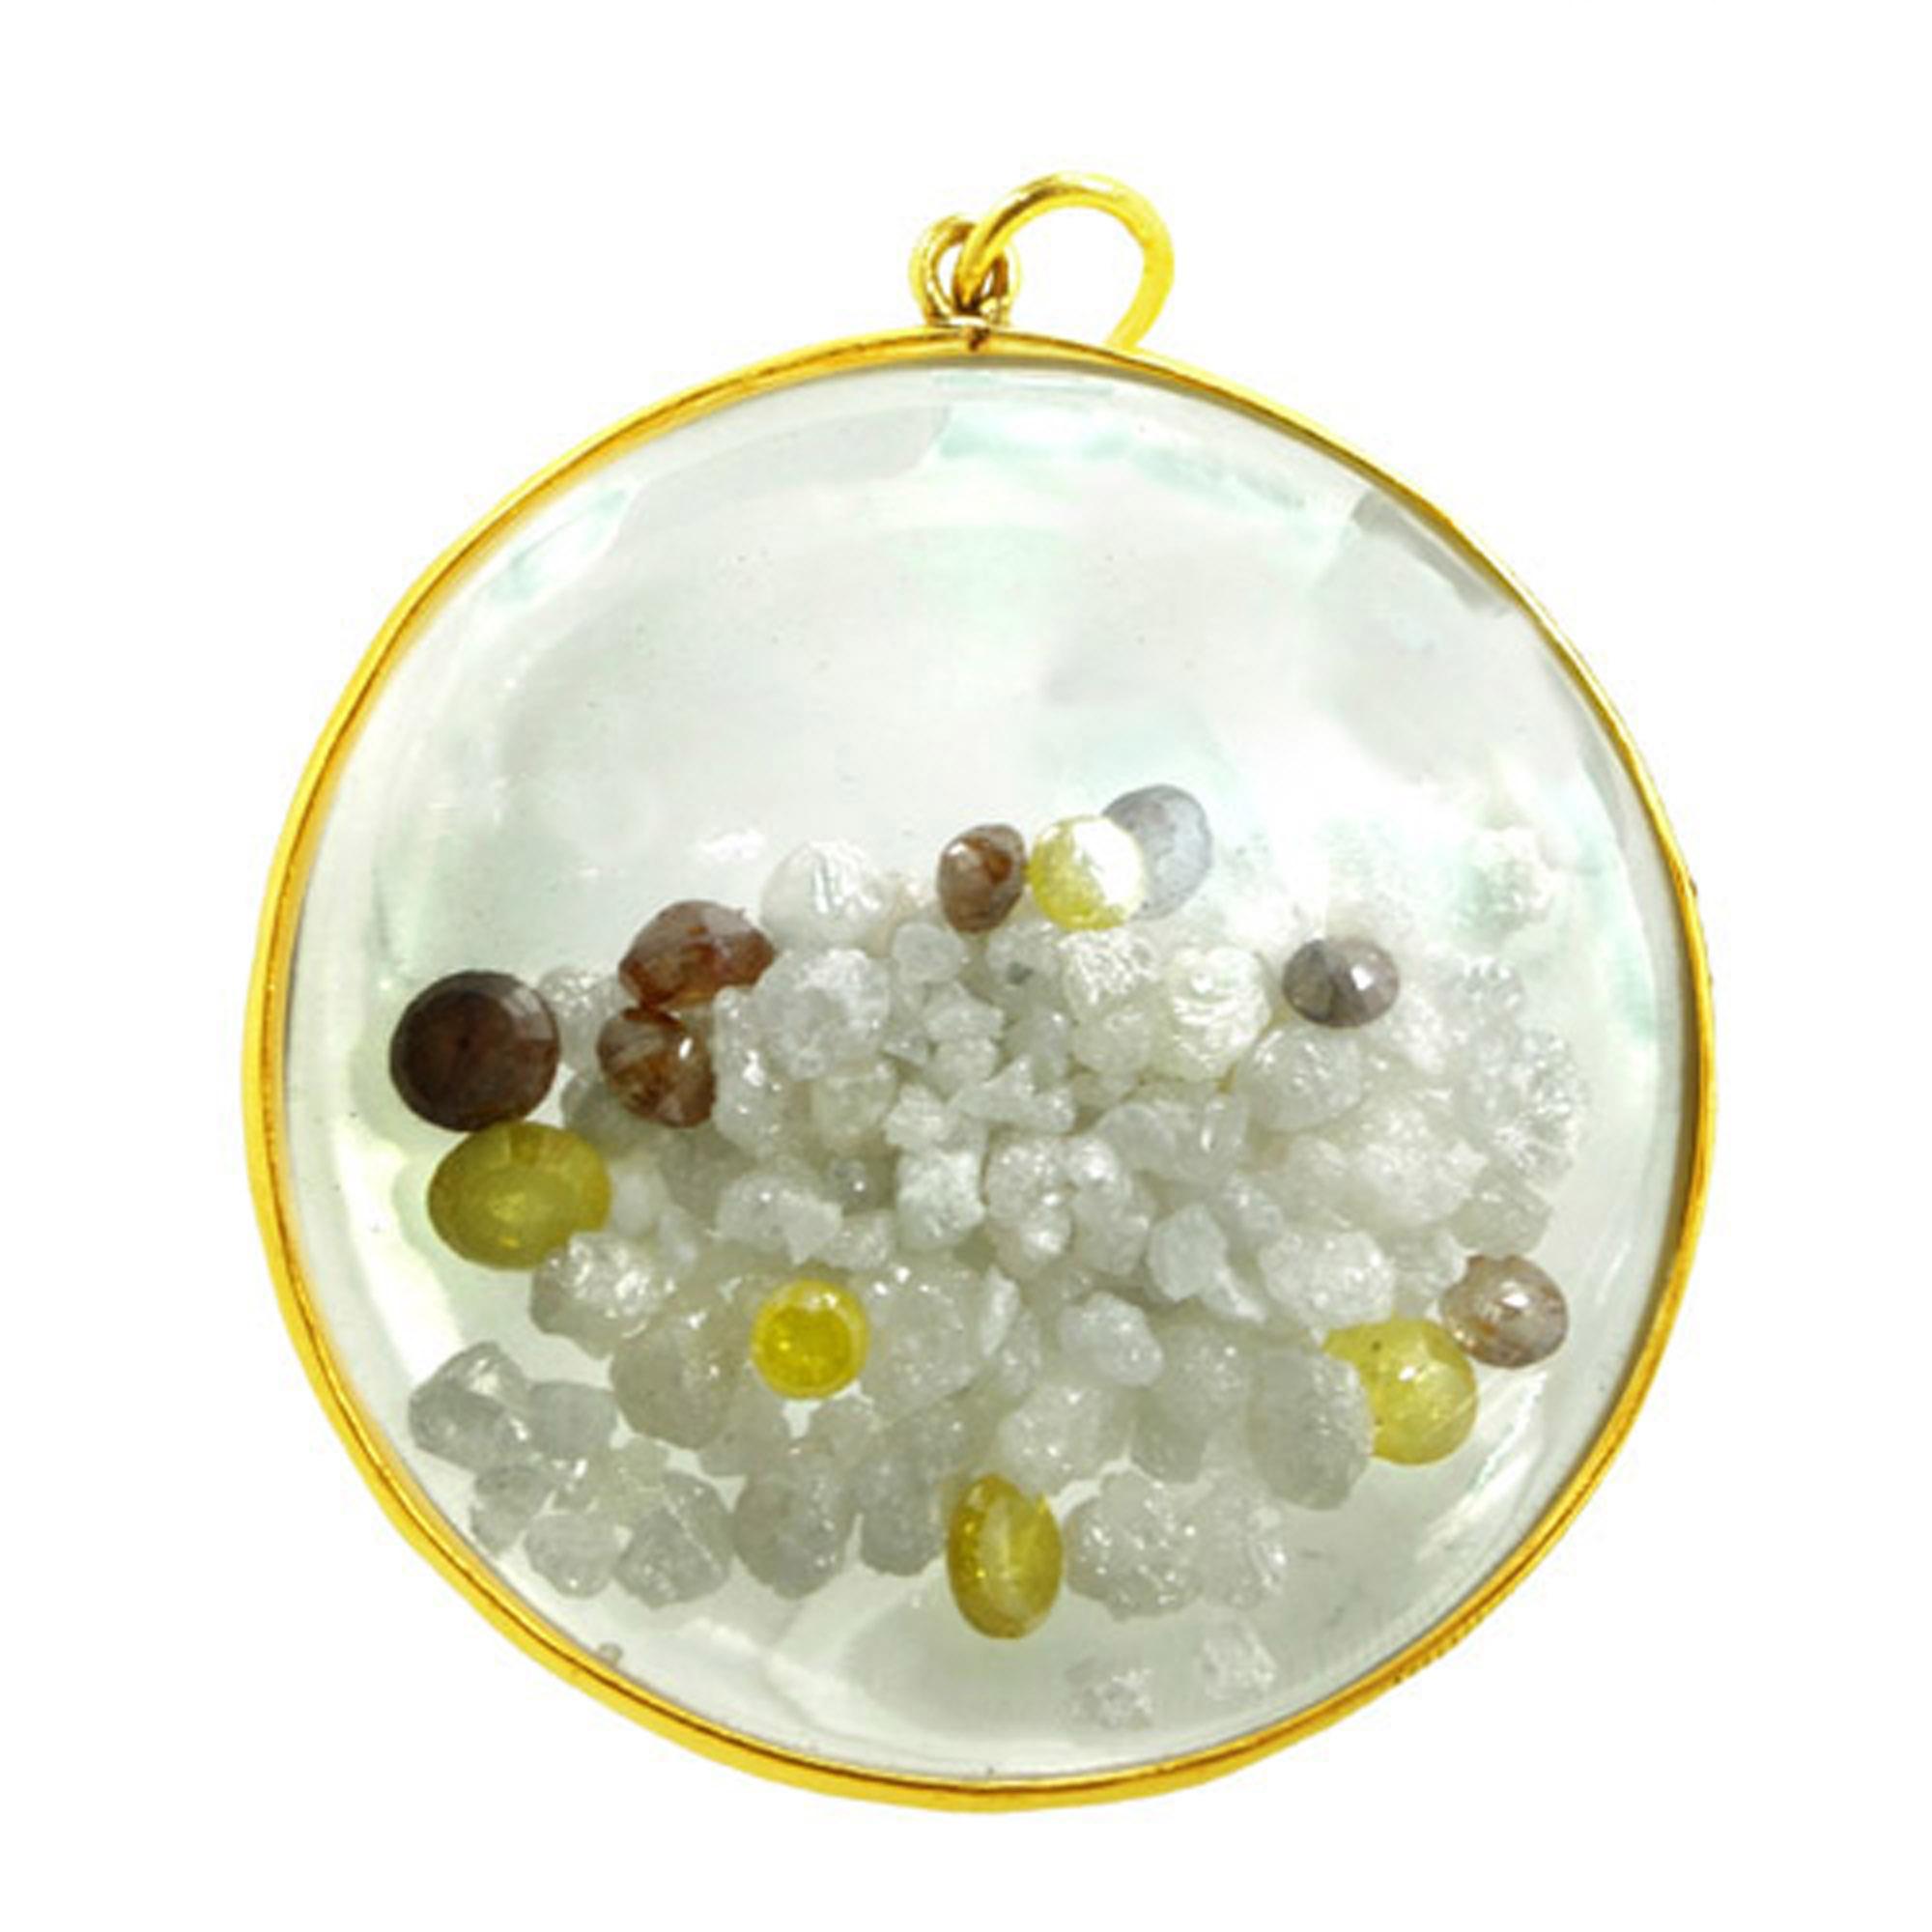 21.83 Natural diamond 14k solid gold crystal shaker pendant